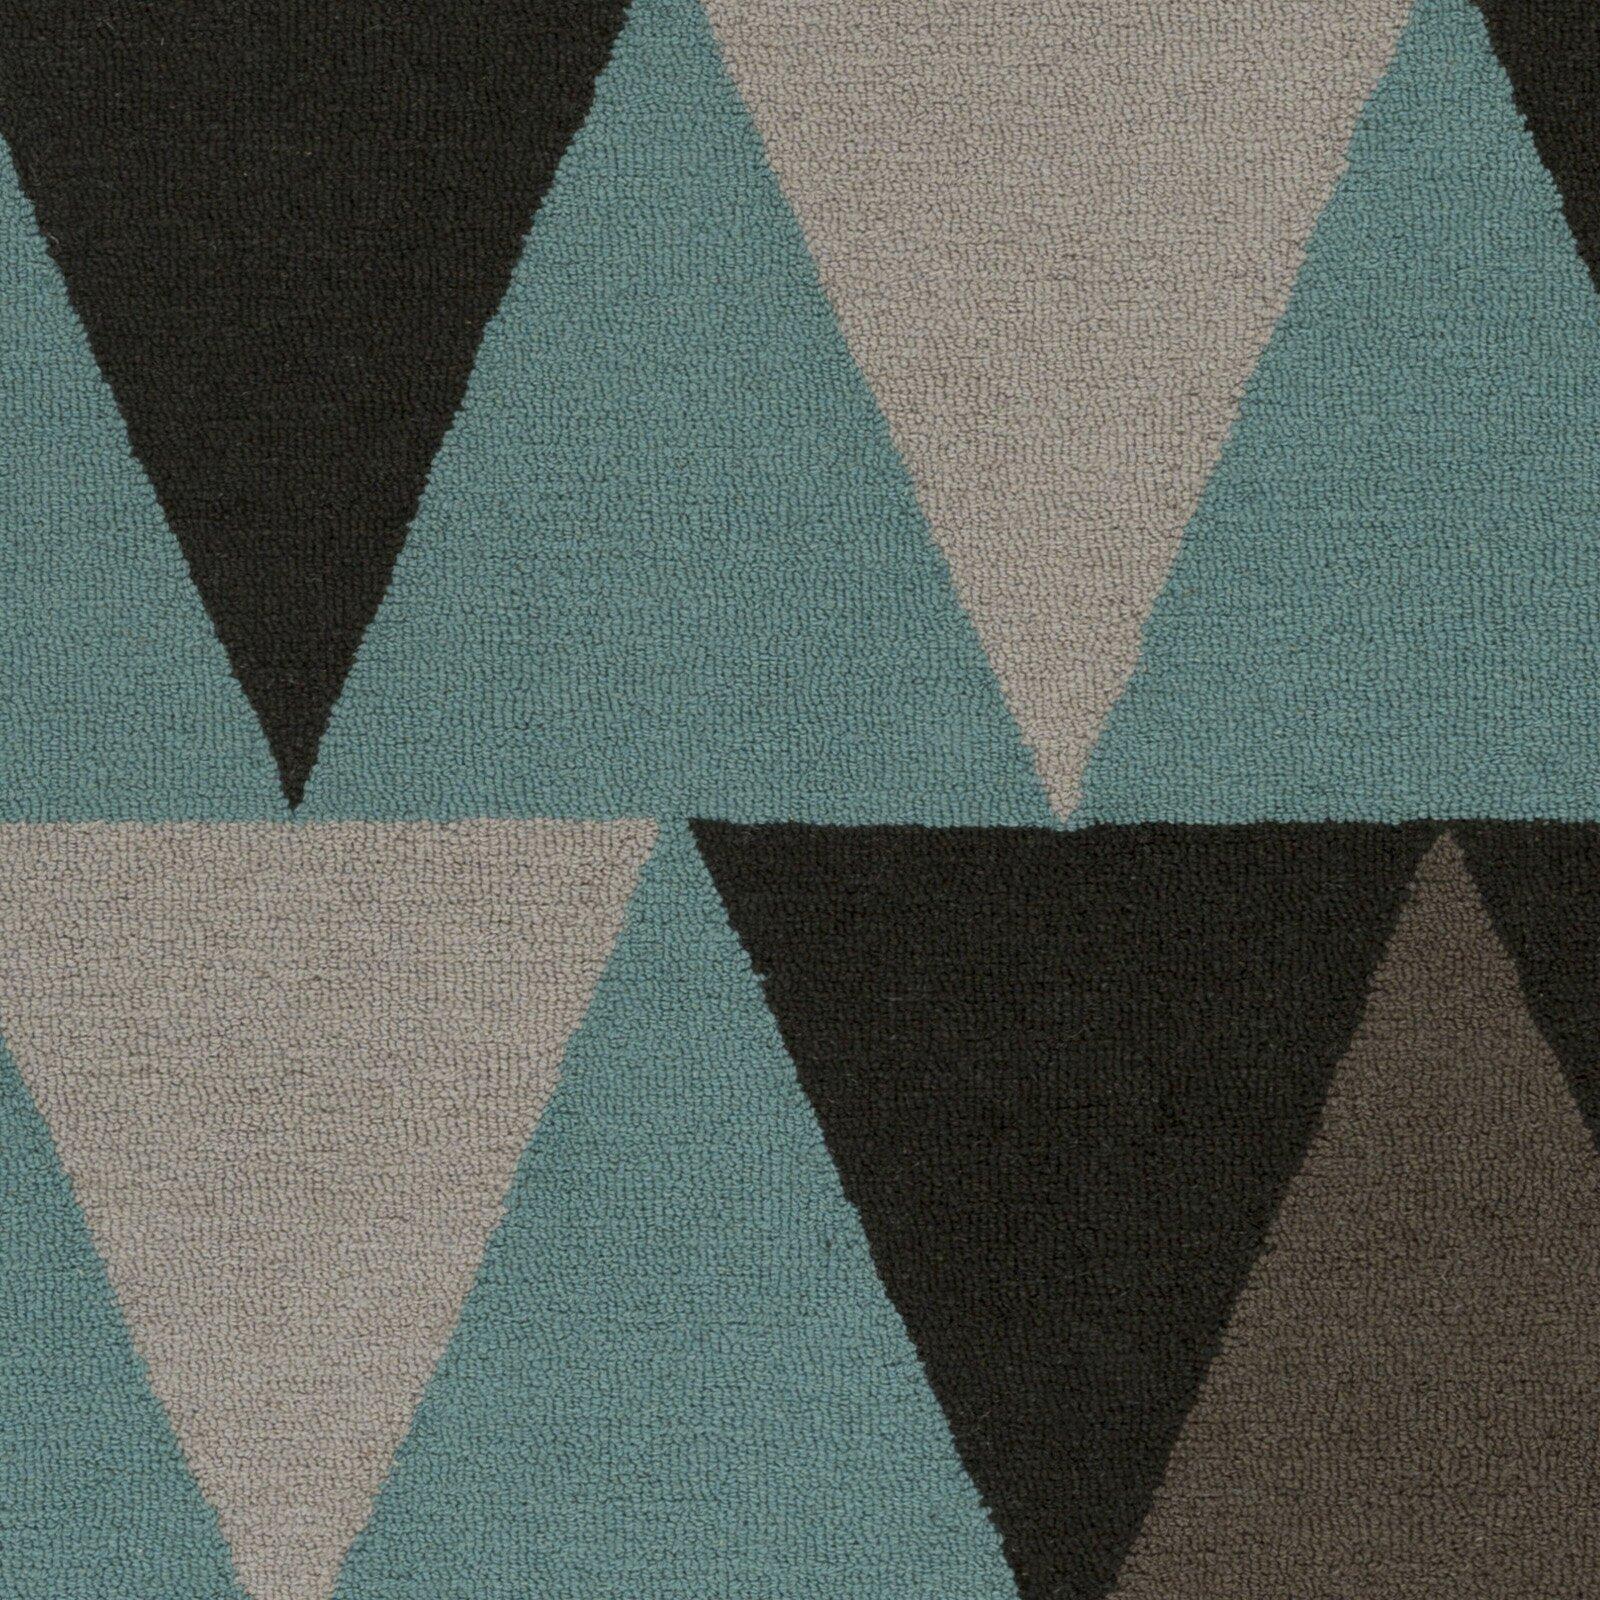 Artistic Weavers Hilda Rae Hand-Crafted Teal/Gray Area Rug